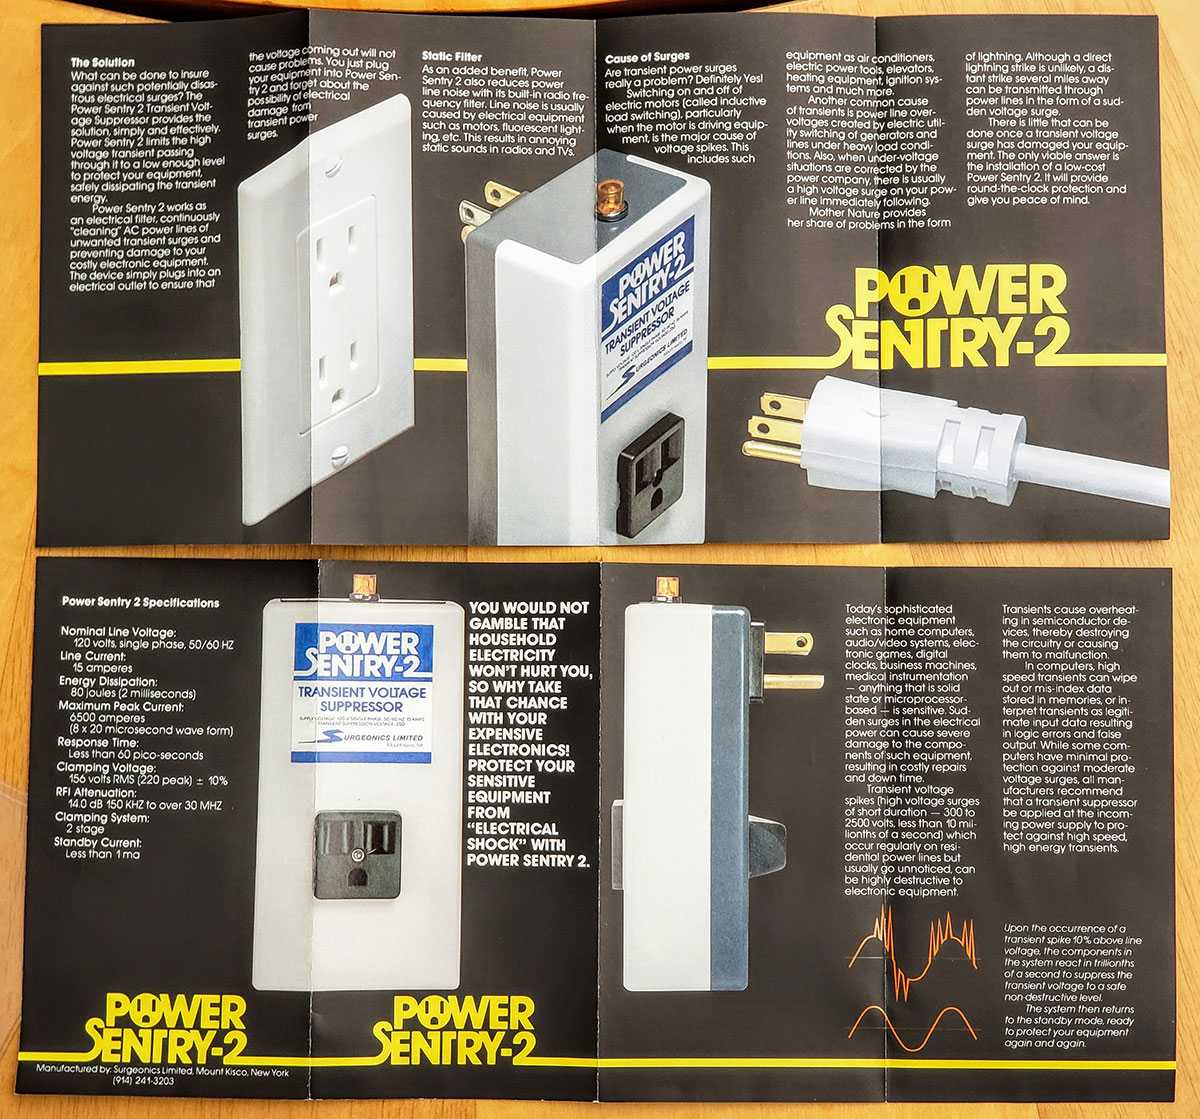 surgonics_power-sentry_brochure_2